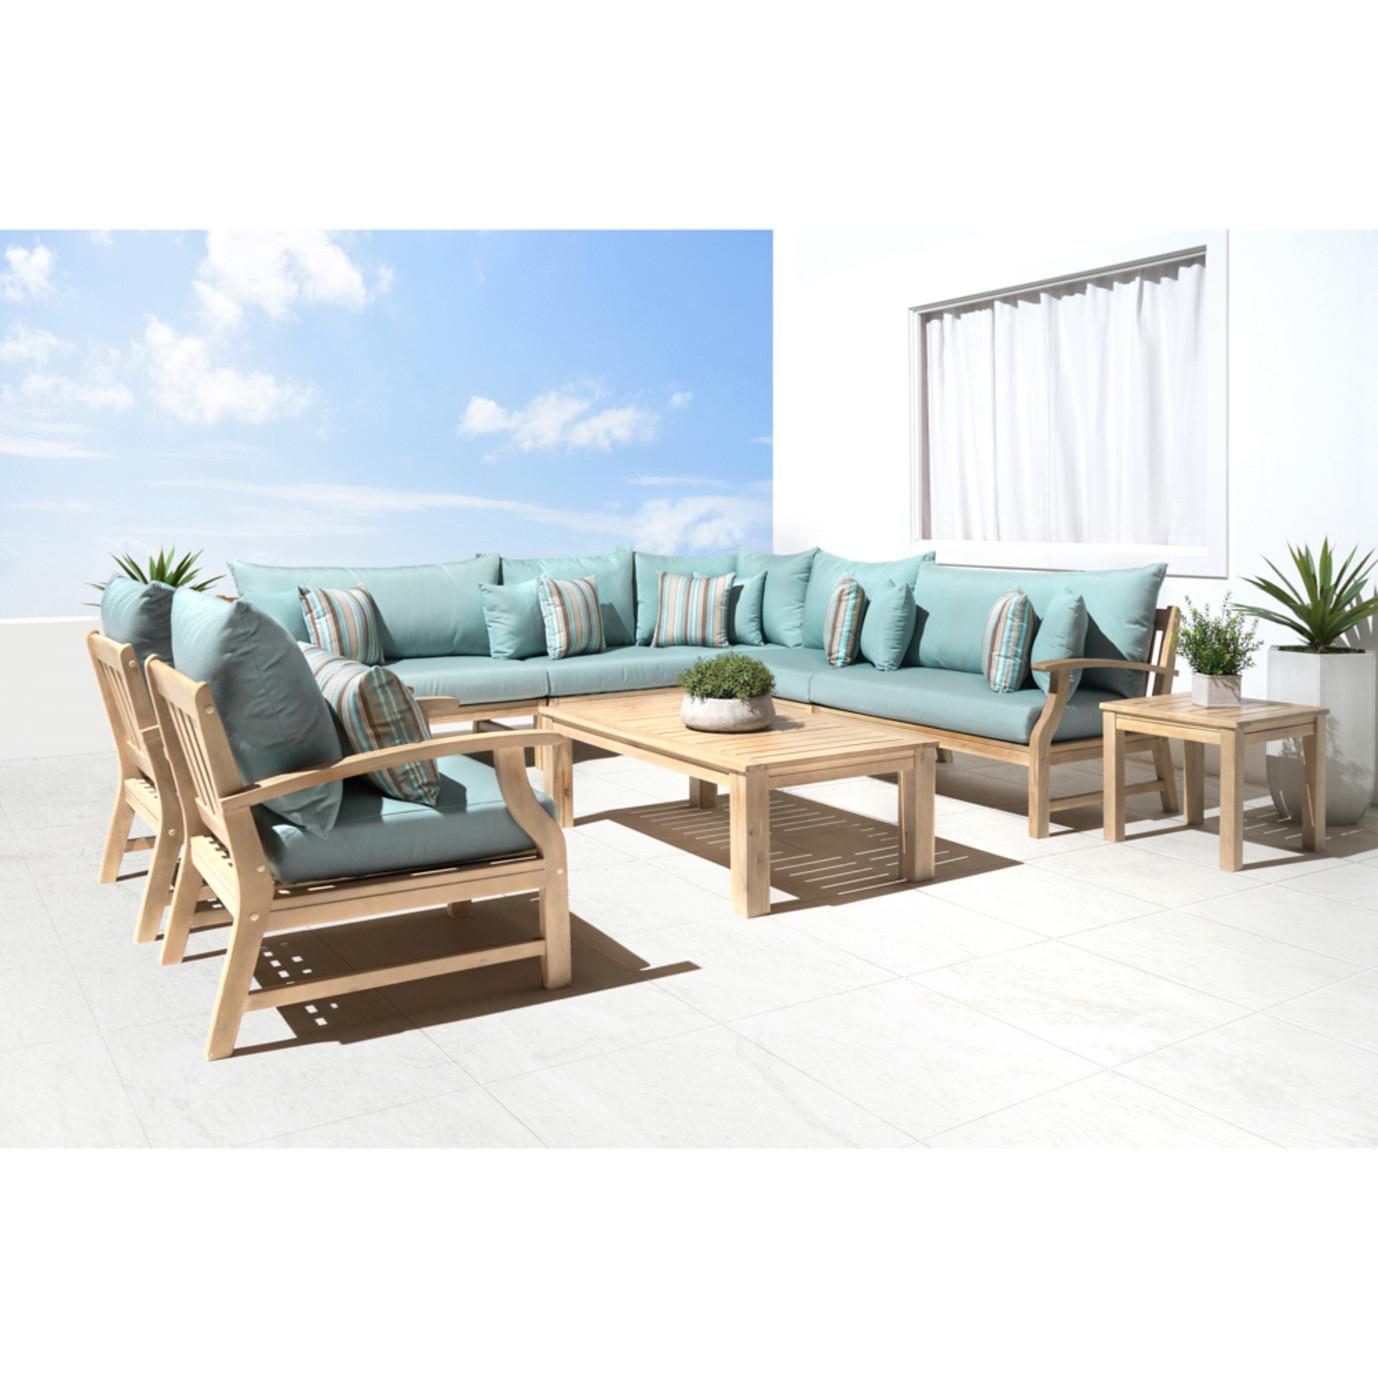 Kooper 9pc Seating Set - Bliss Blue